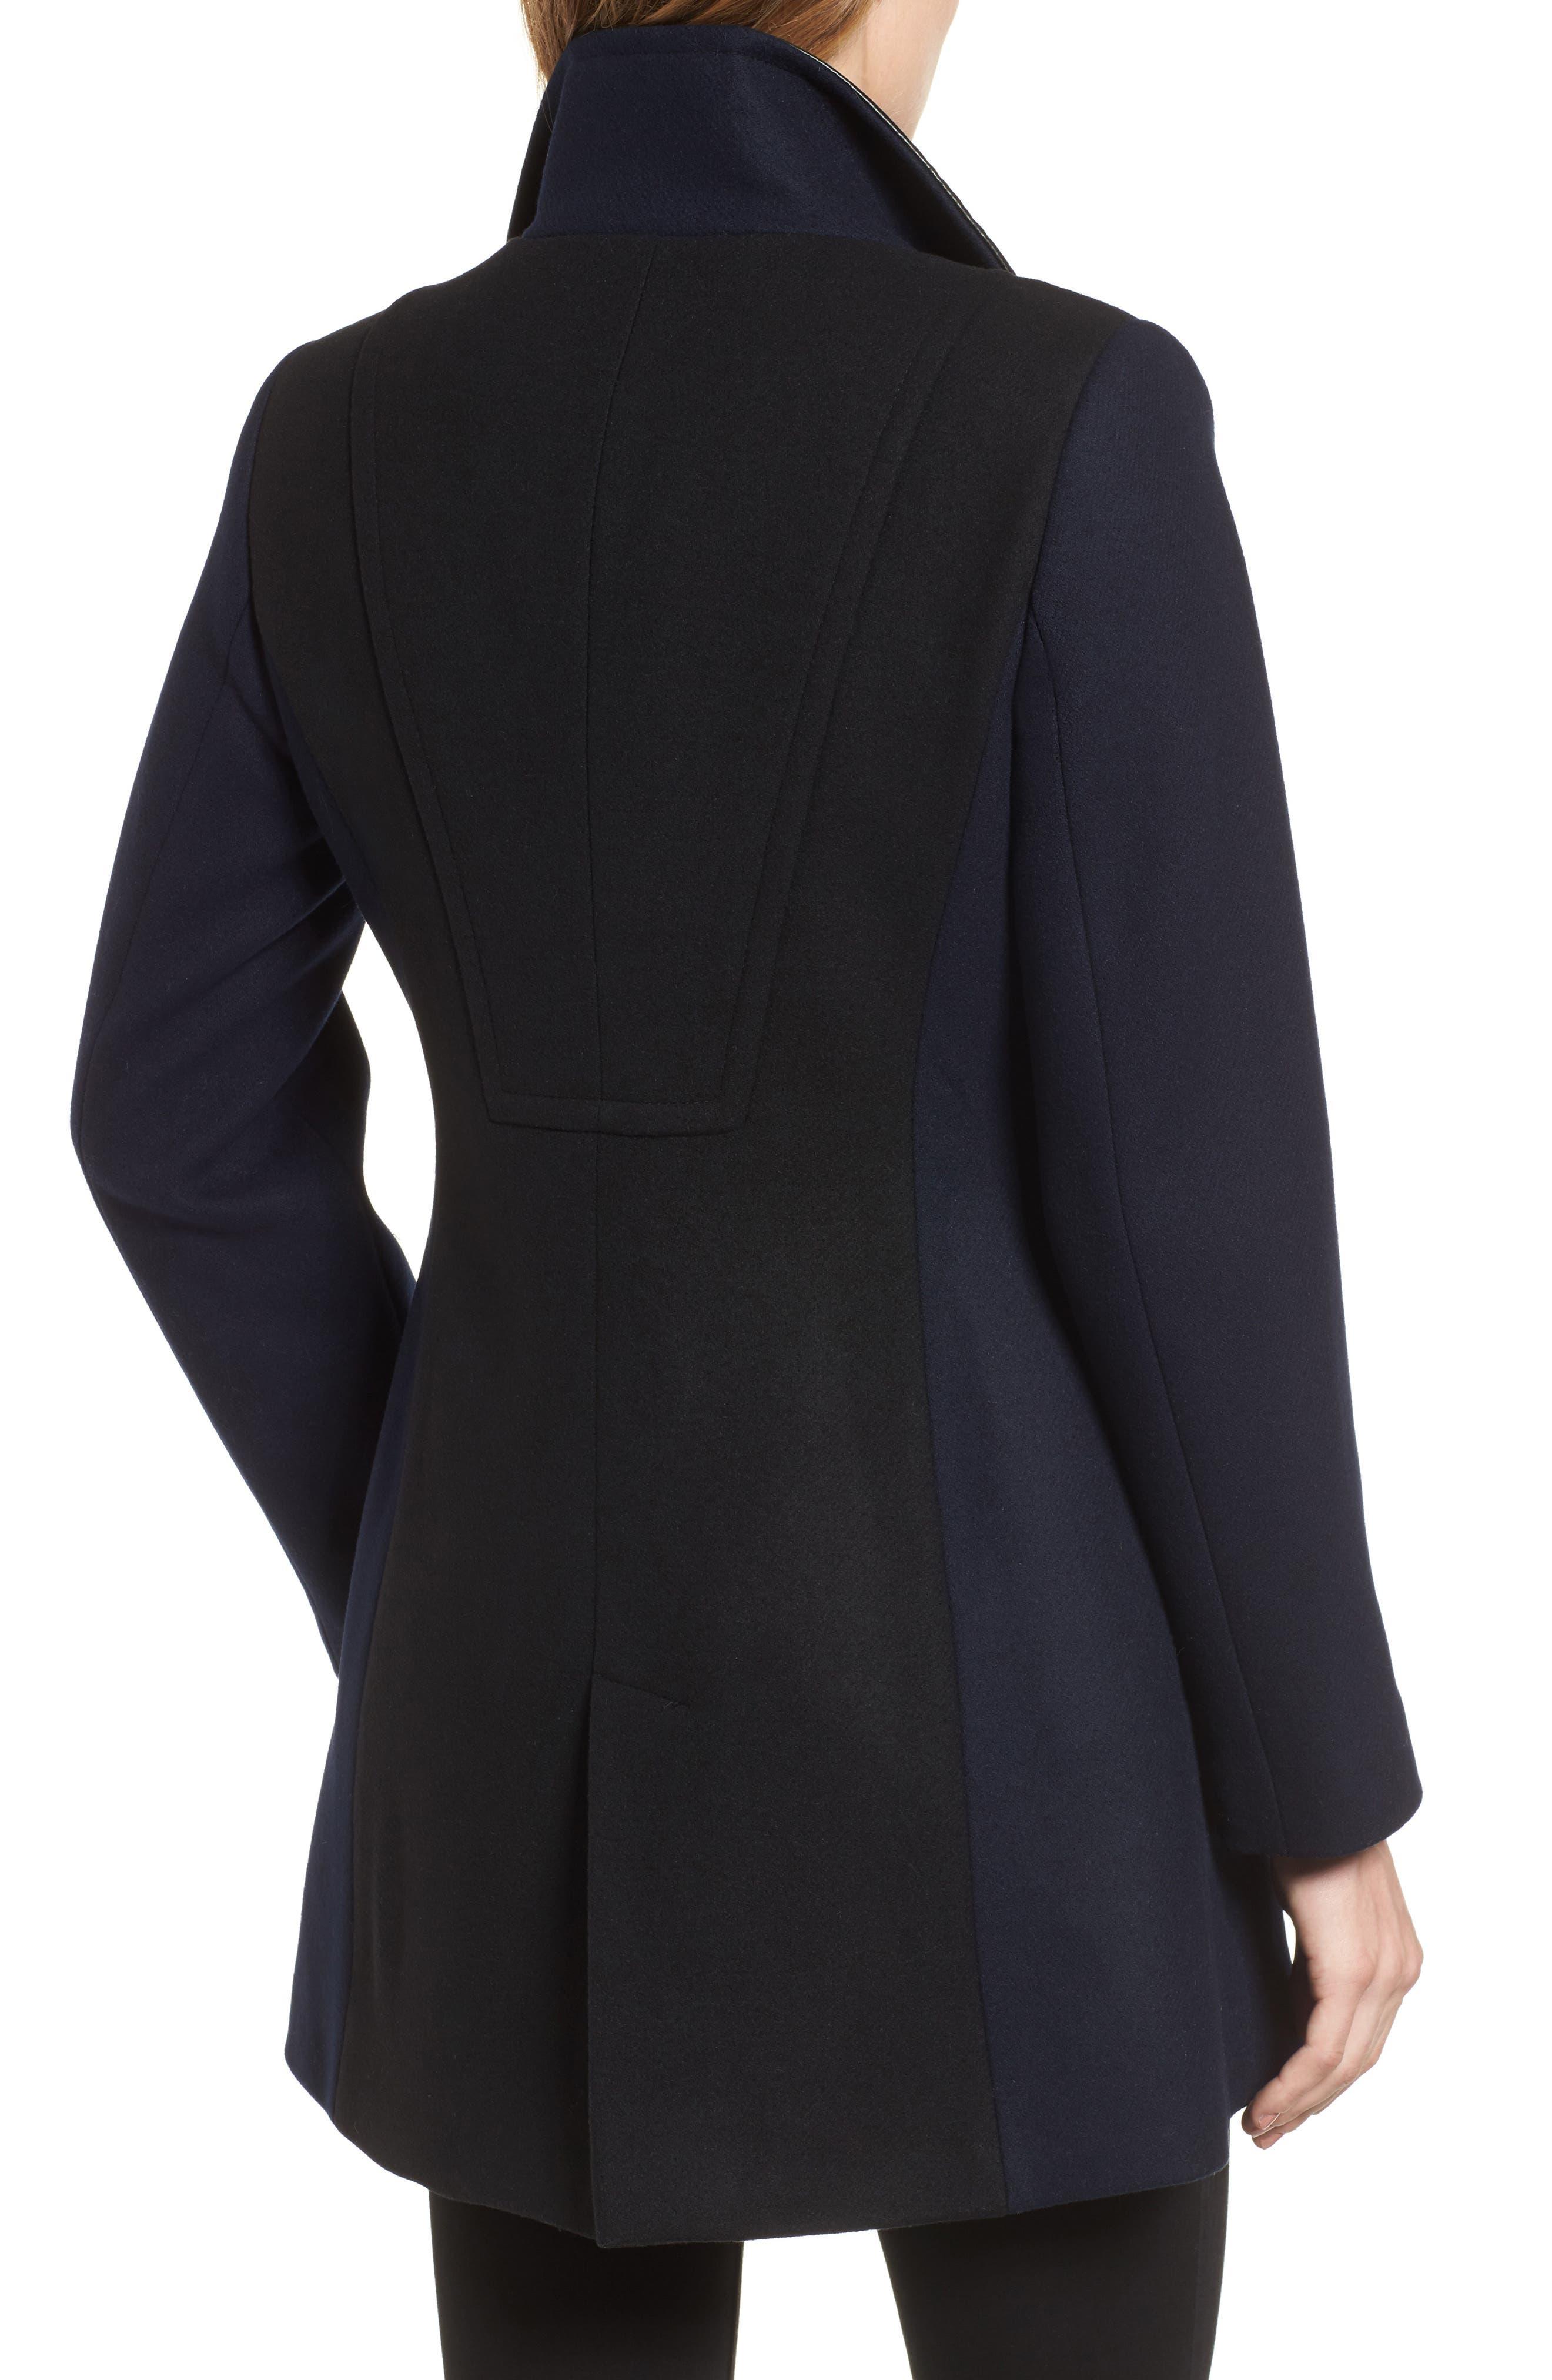 Eleanor Leather Trim Wool Blend Coat,                             Alternate thumbnail 2, color,                             Black/ Navy